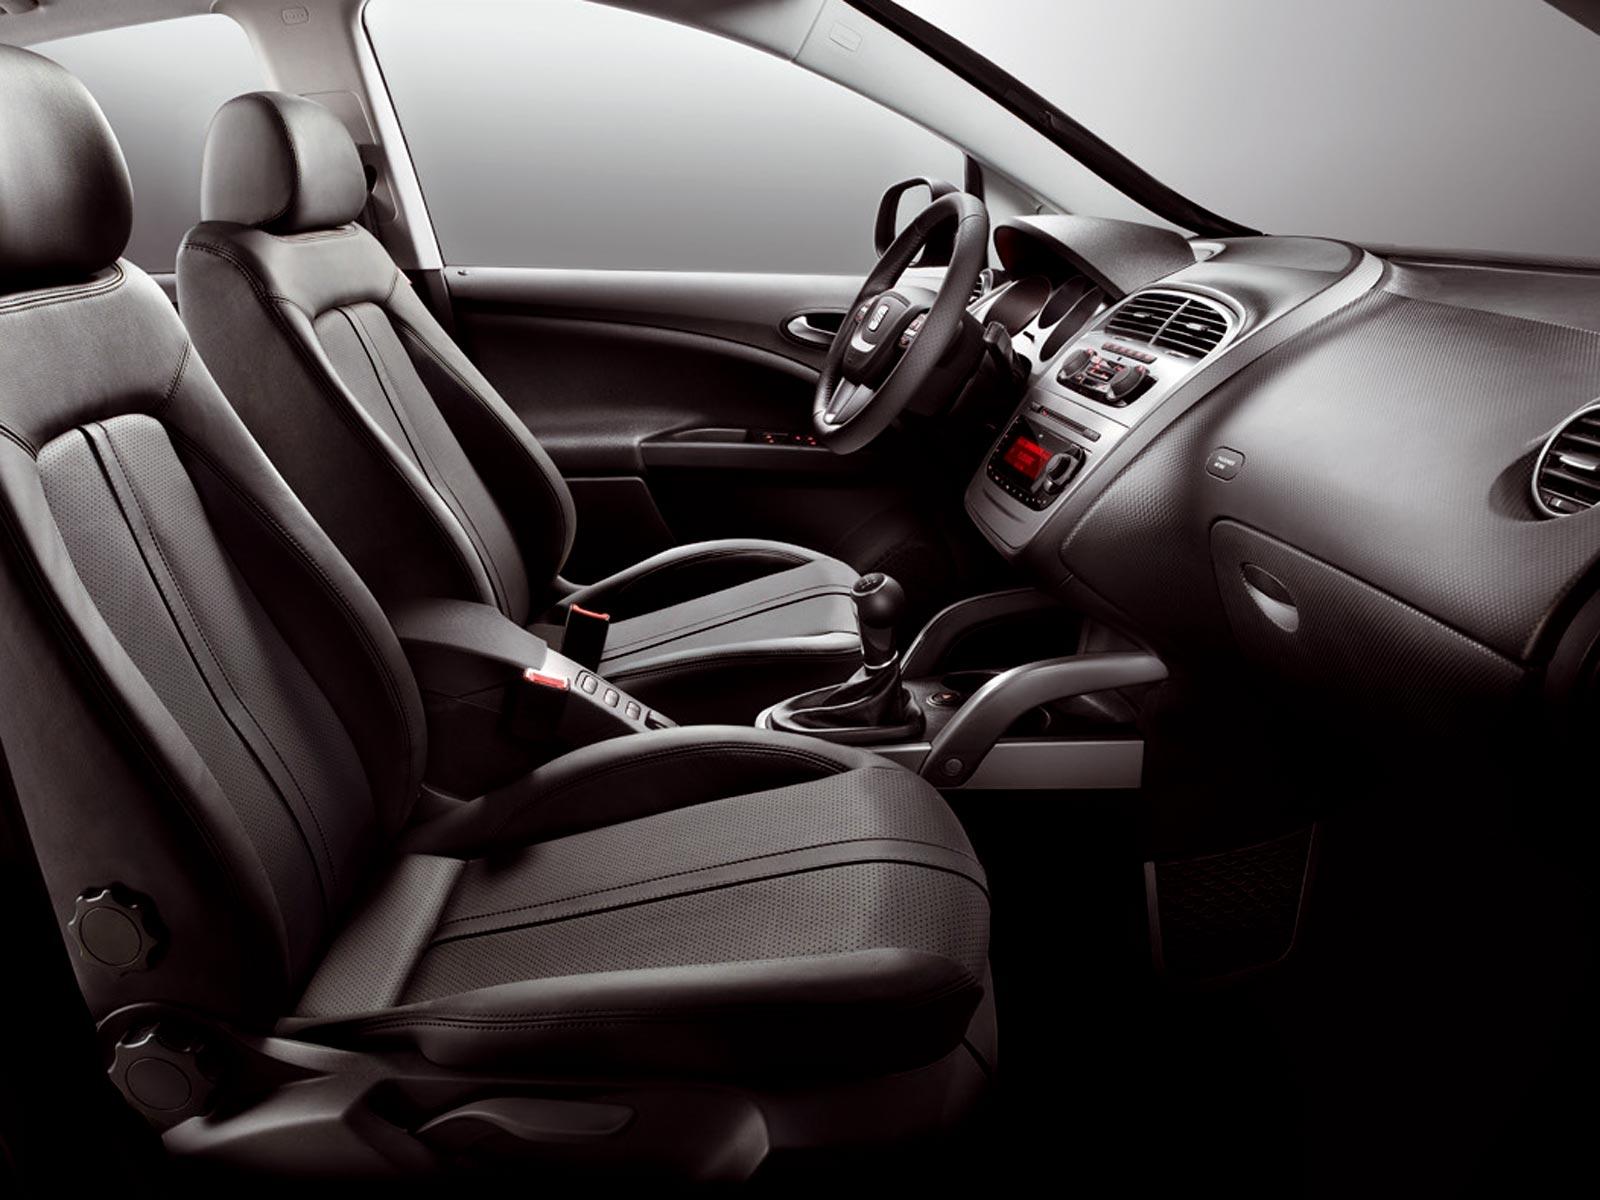 2009 Seat Altea Freetrack (c) Seat